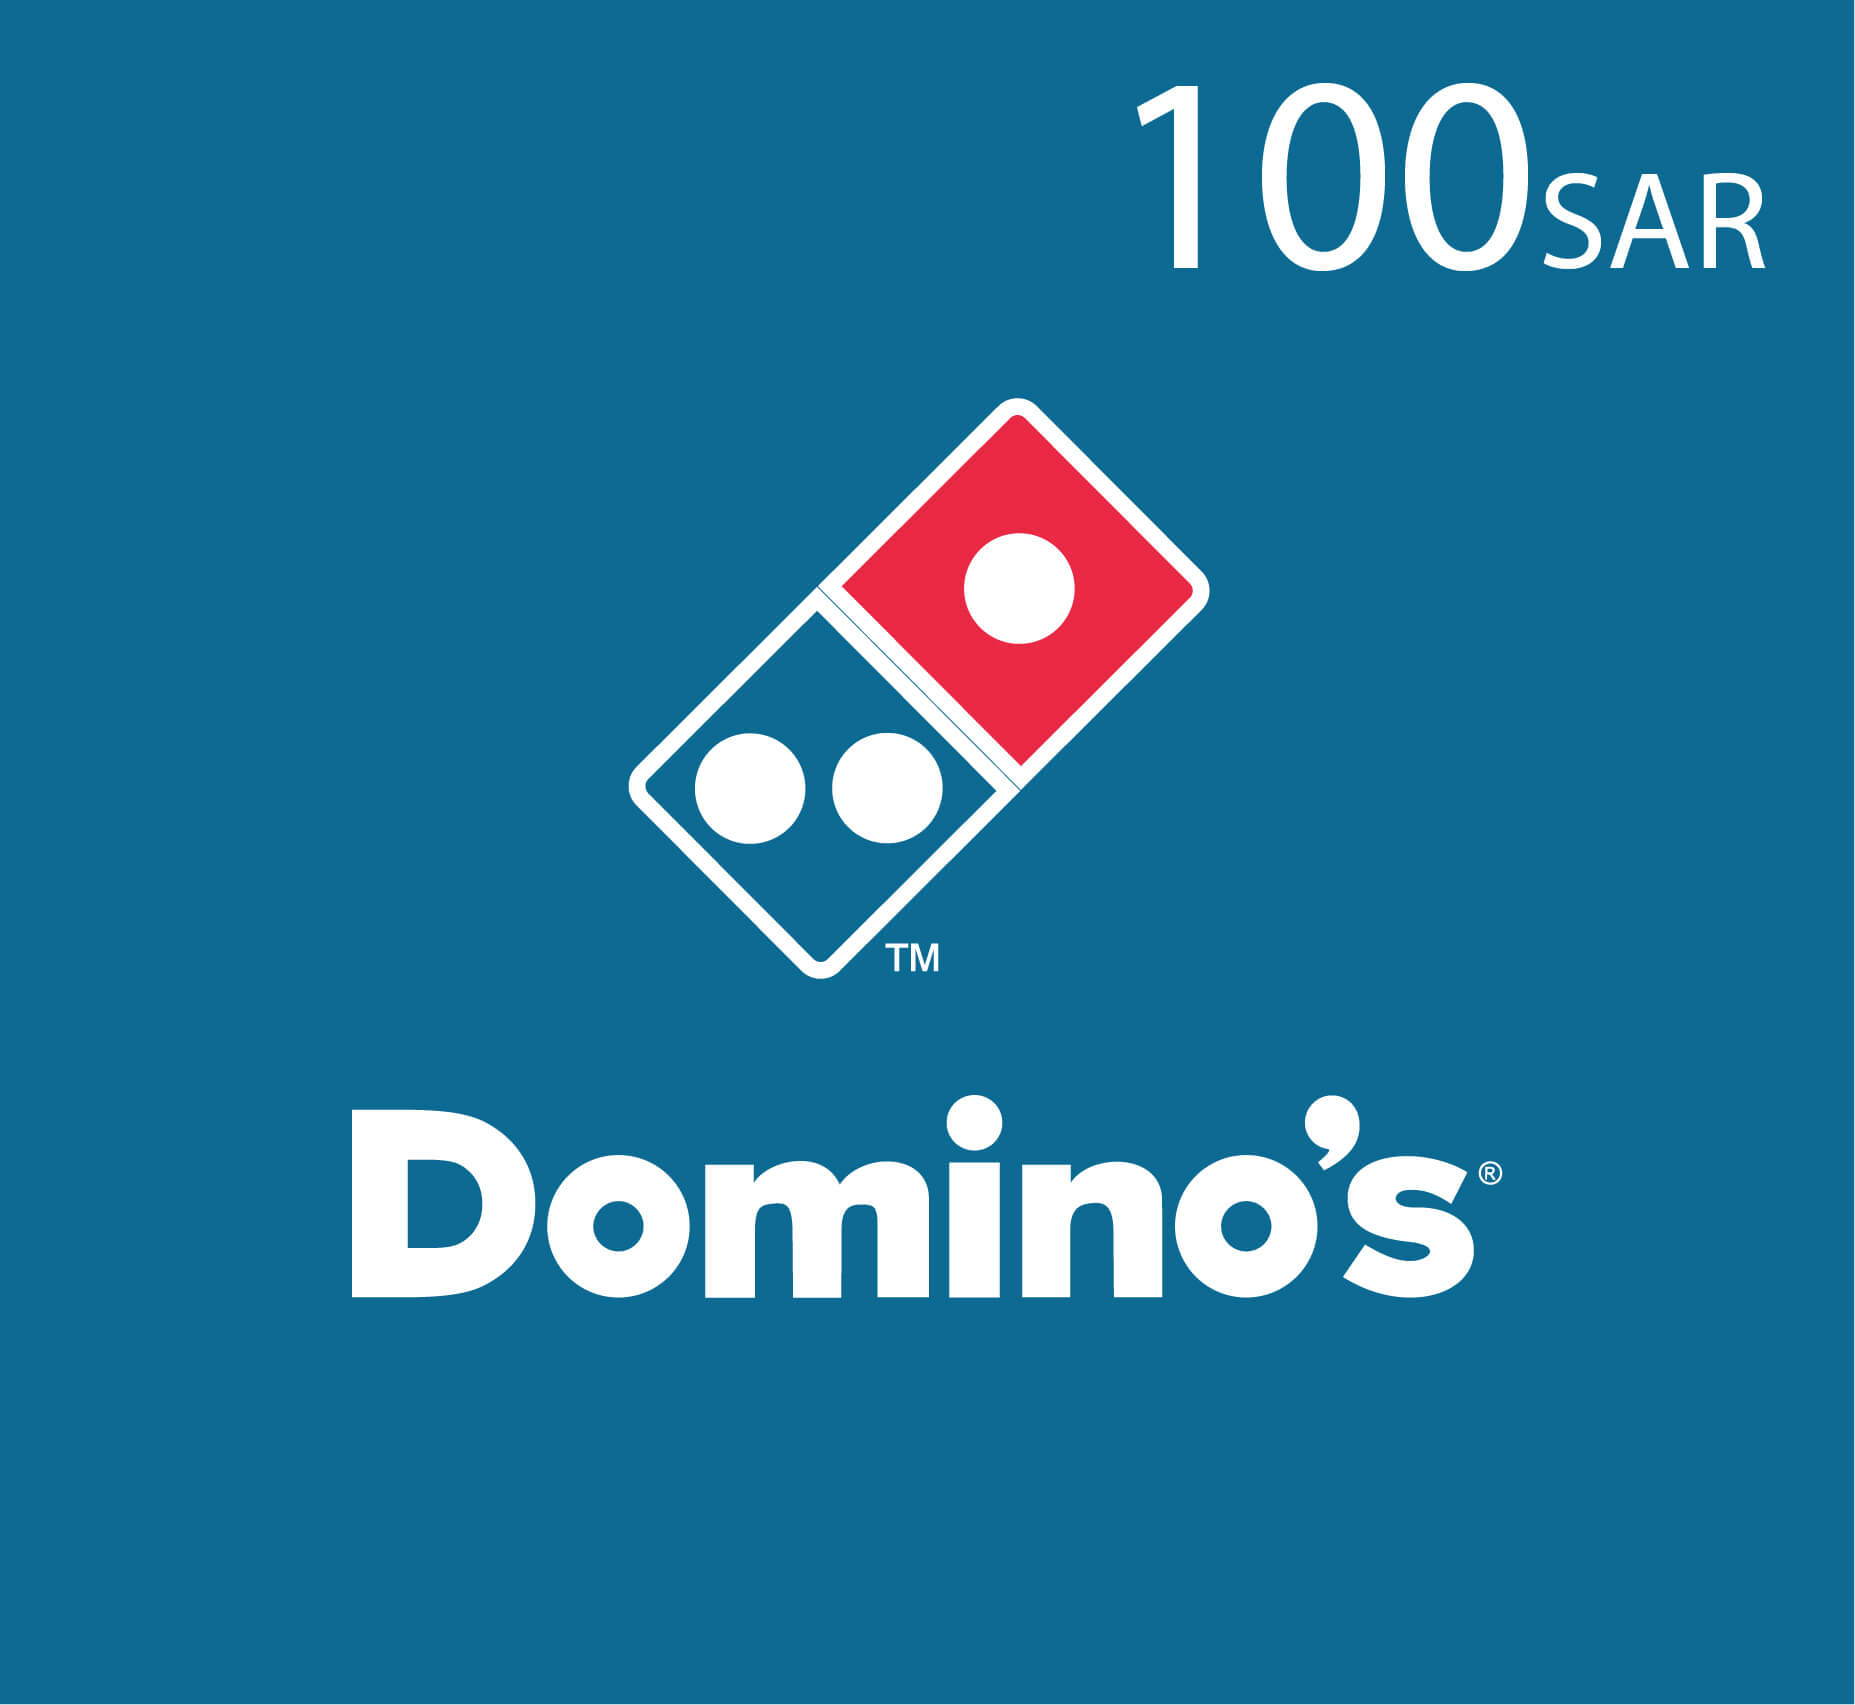 Dominos Pizza Gift Card - 100 SAR